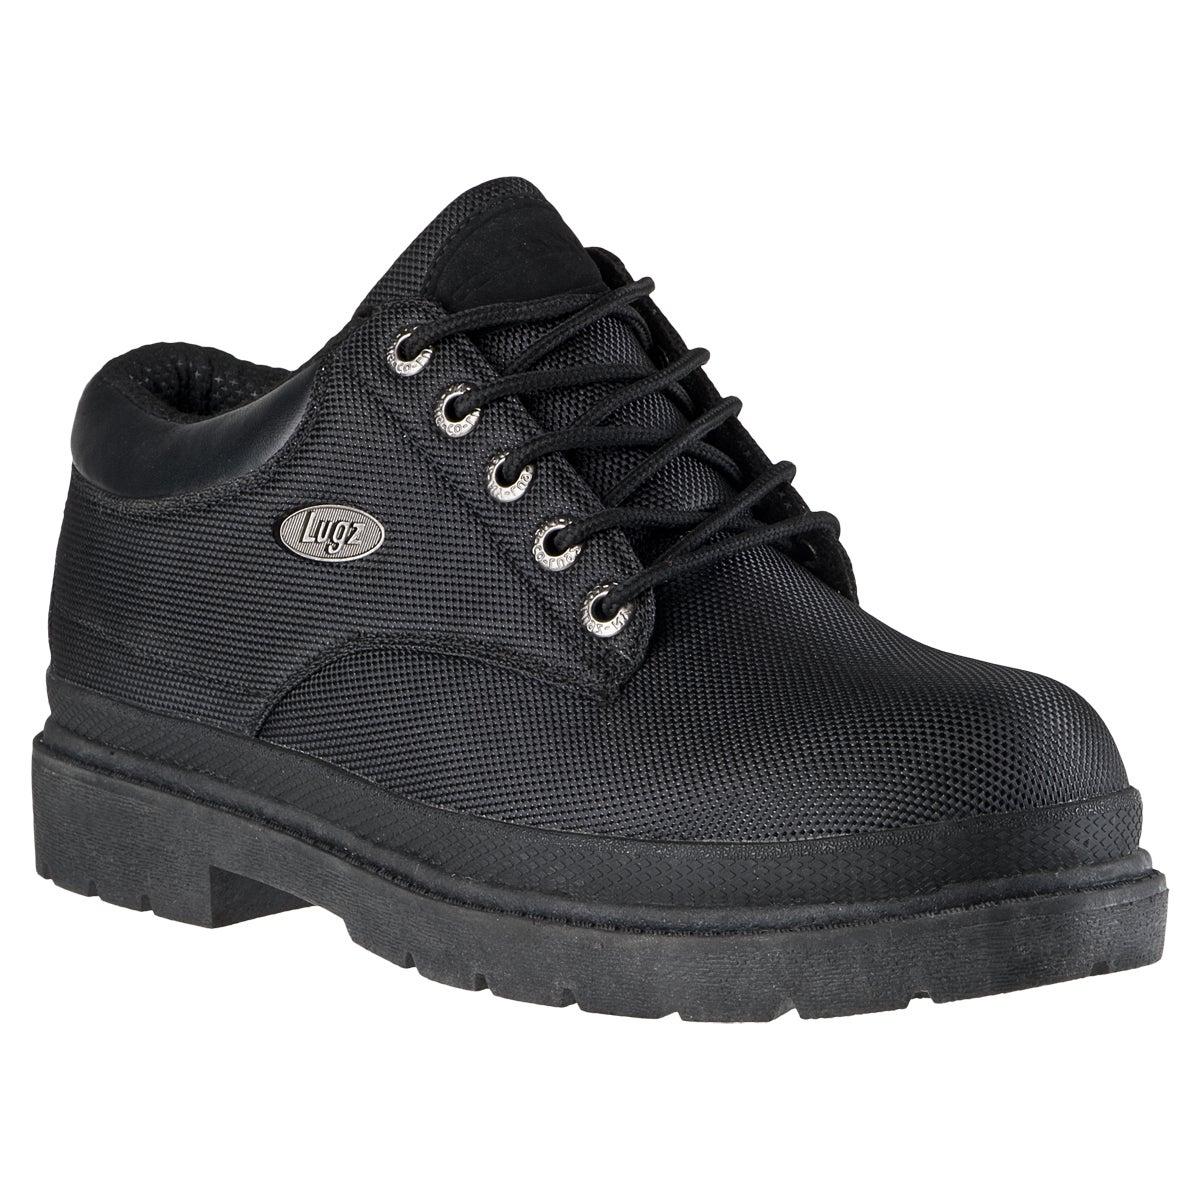 Lugz Men's 'Drifter Lo Ballistic' Black Nylon Boots